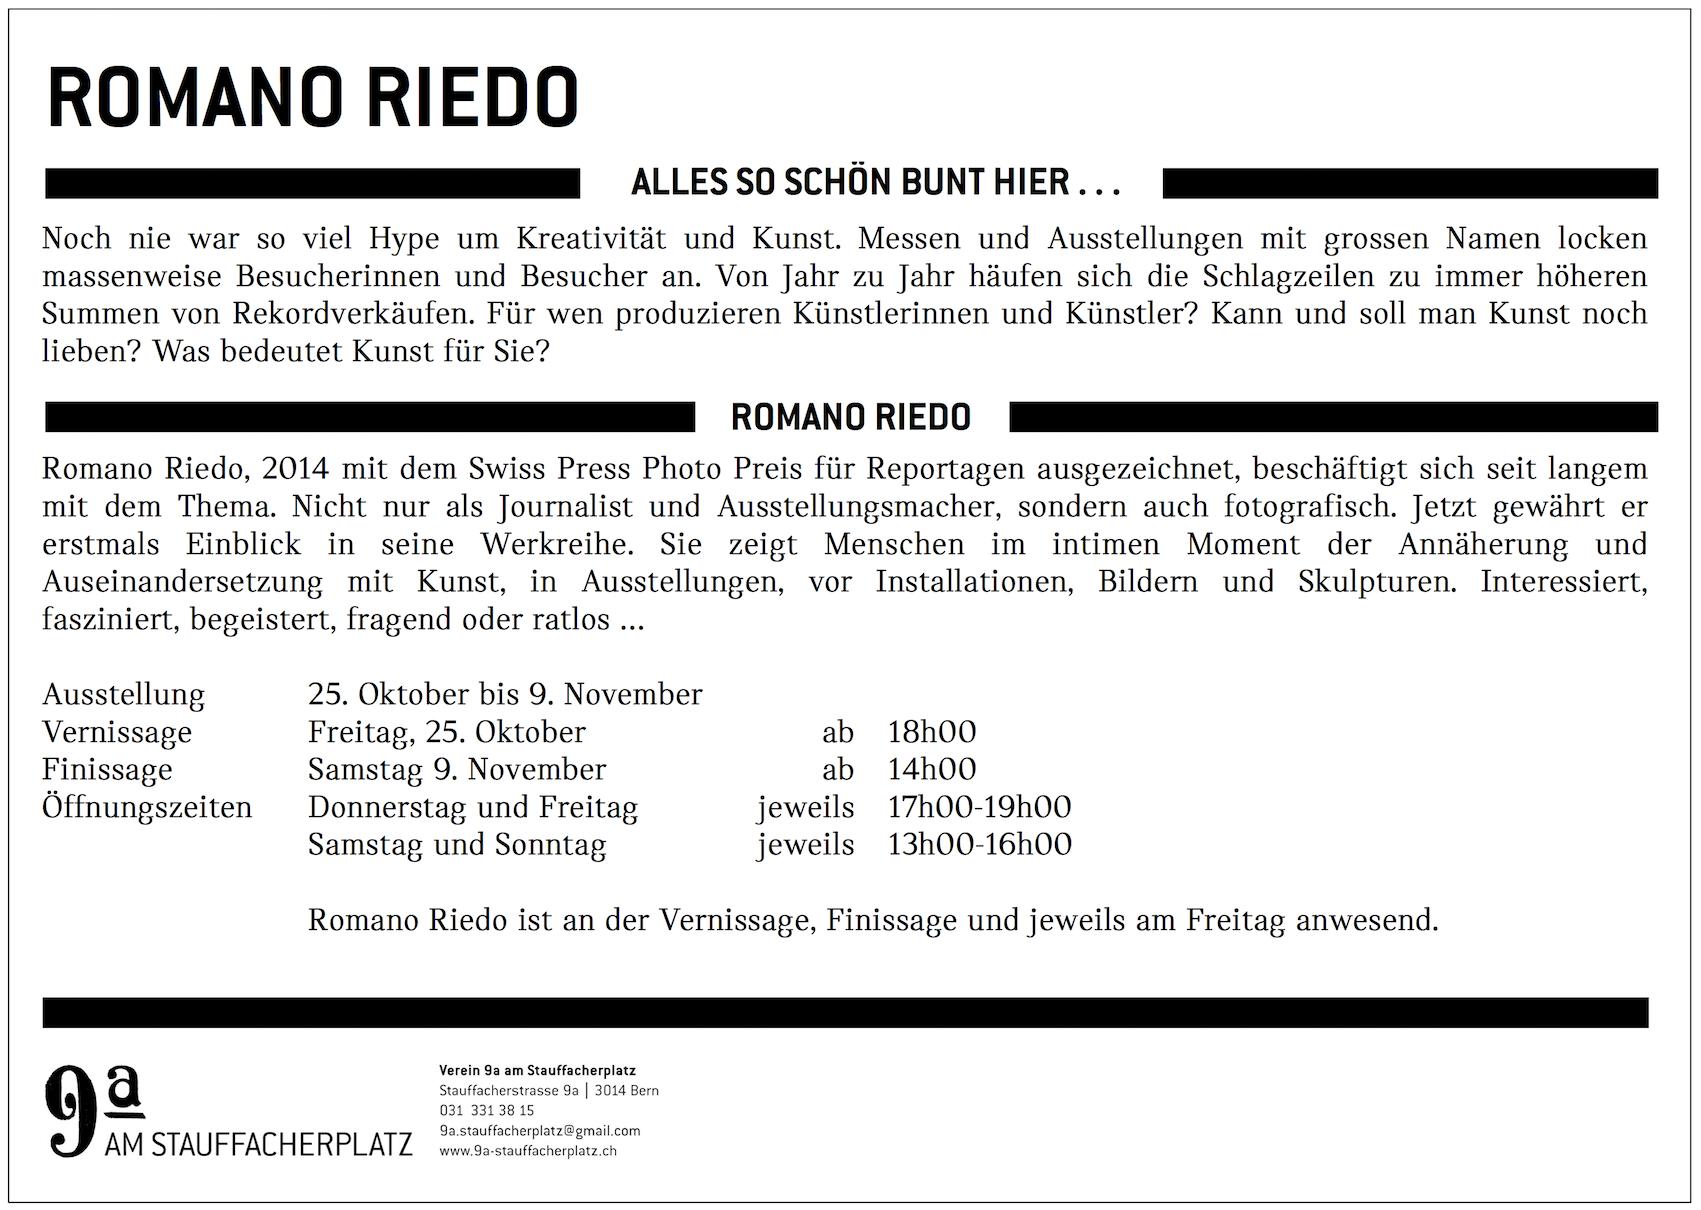 http://www.romanoriedo.ch/files/gimgs/1_artefakte-karte-text-m.png